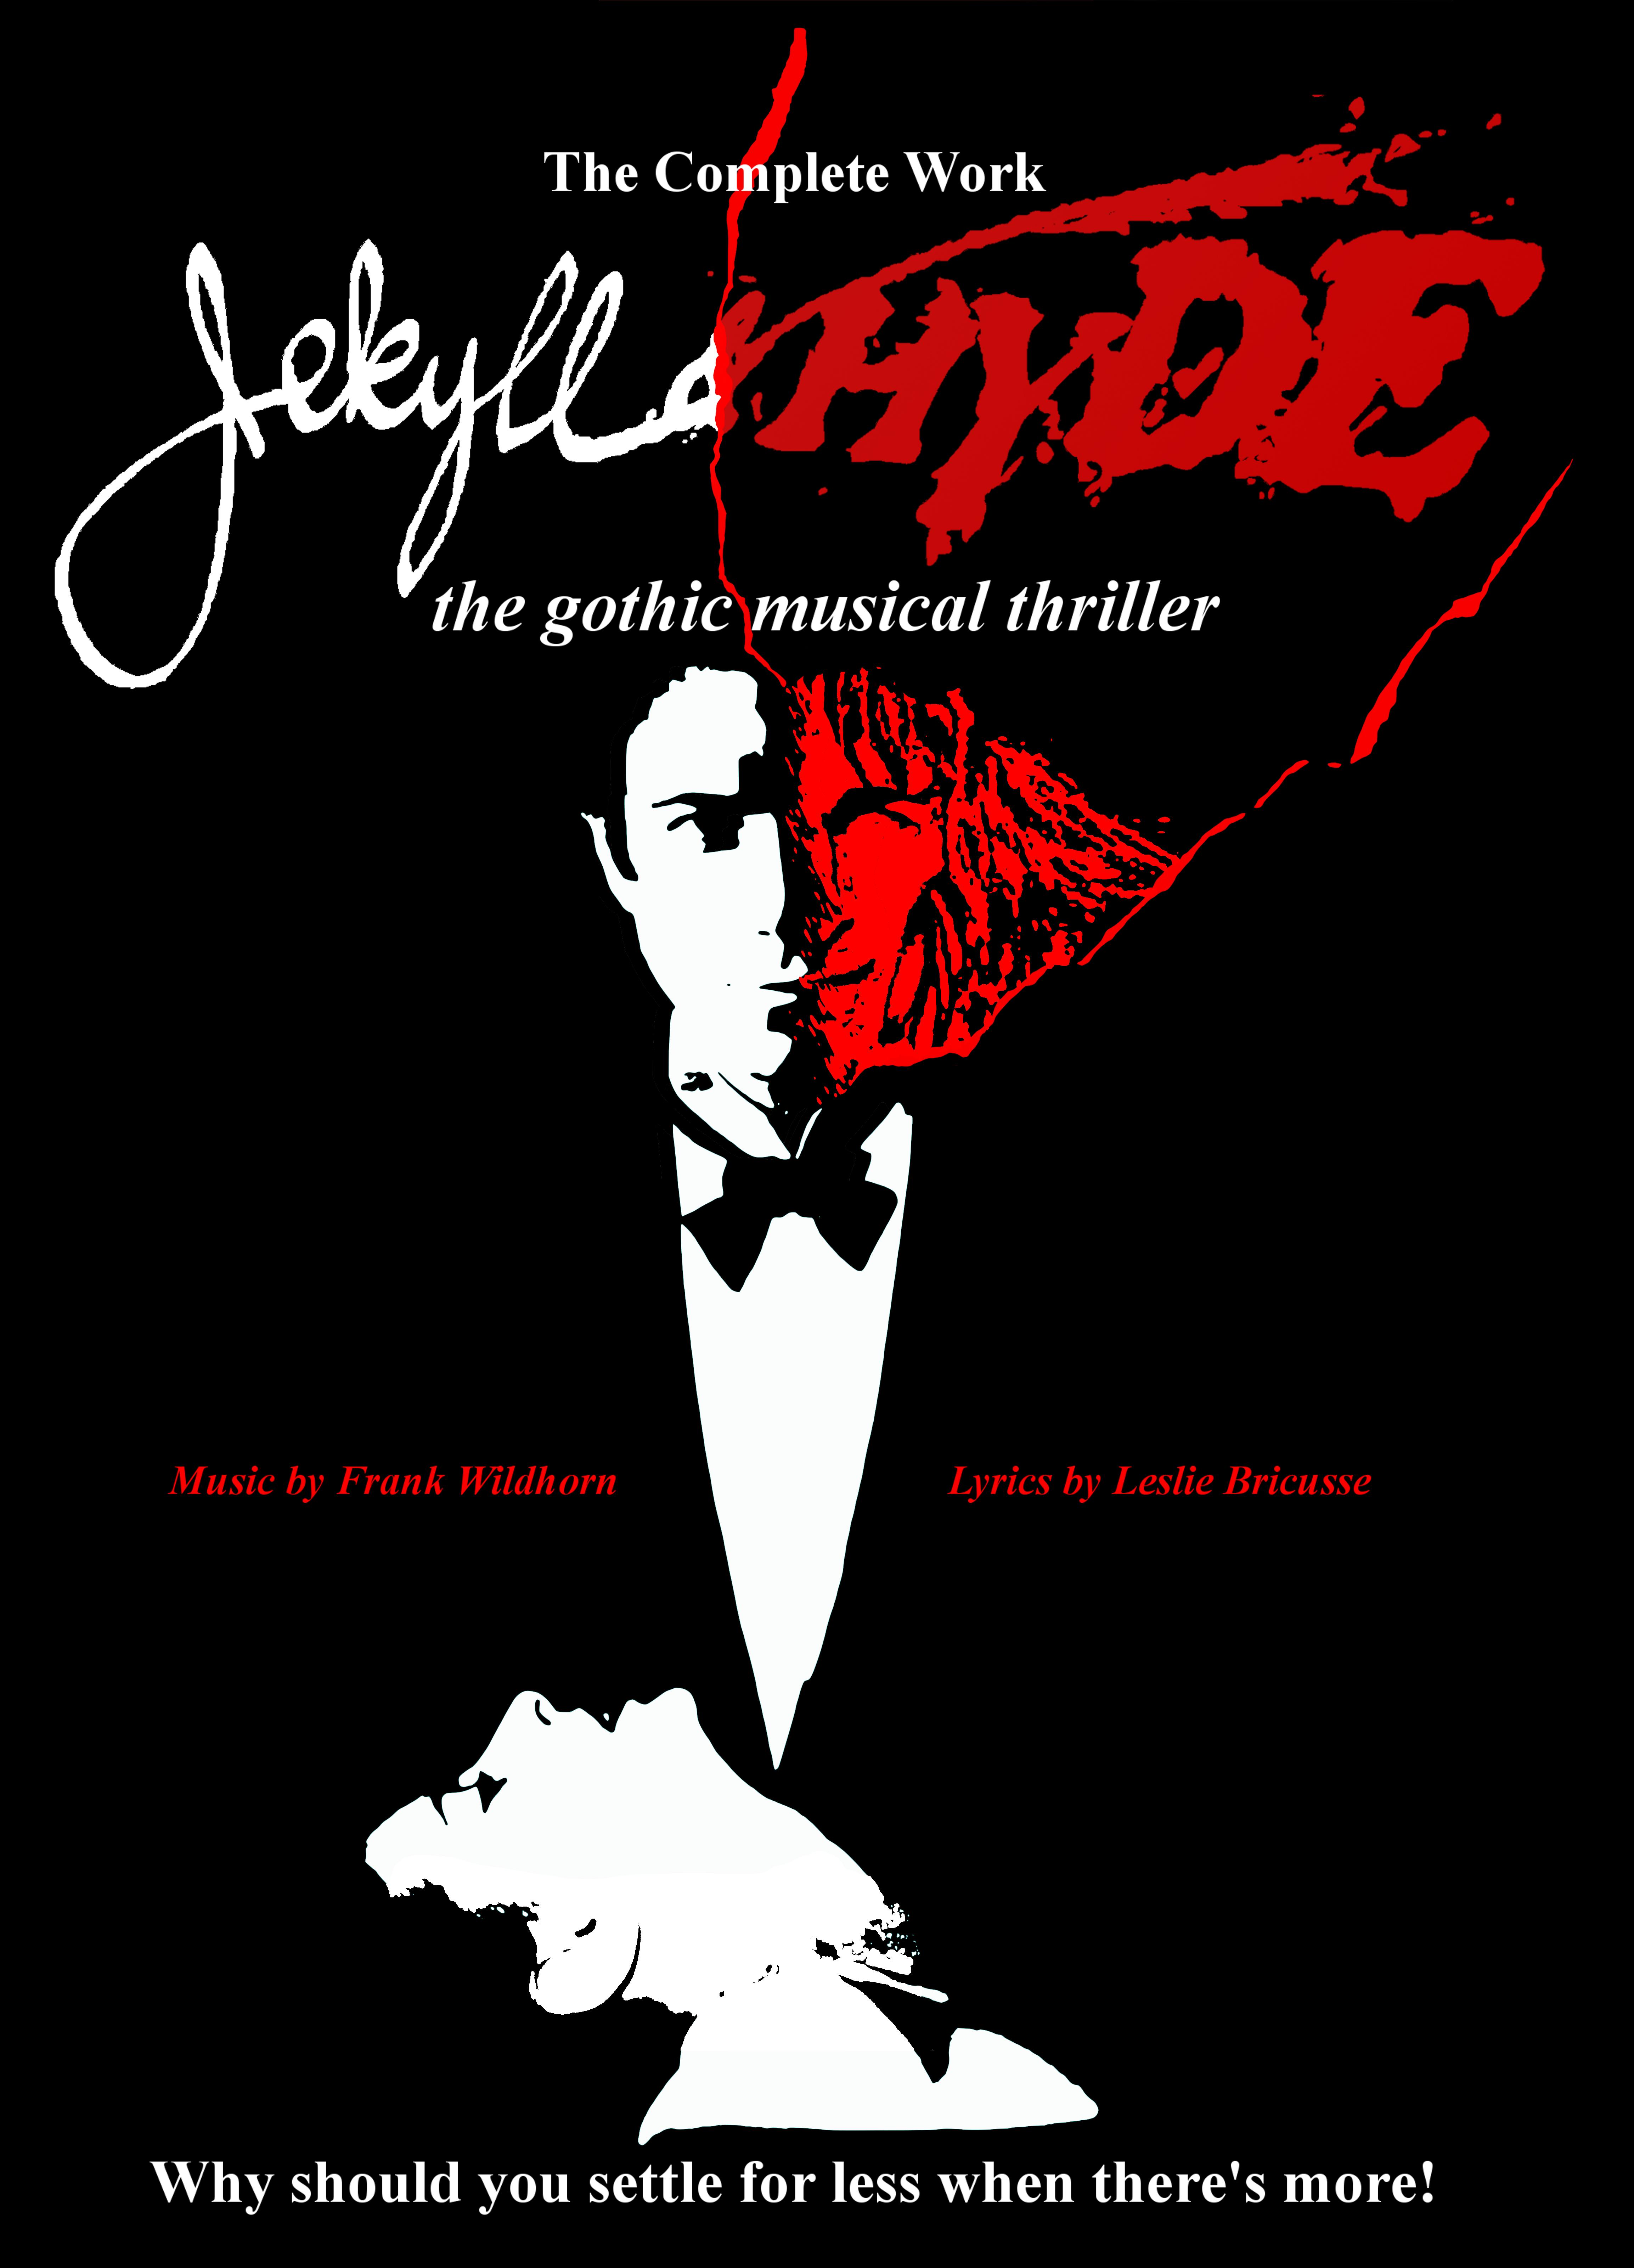 jekyllhyde completist script by holyguyver on deviantart